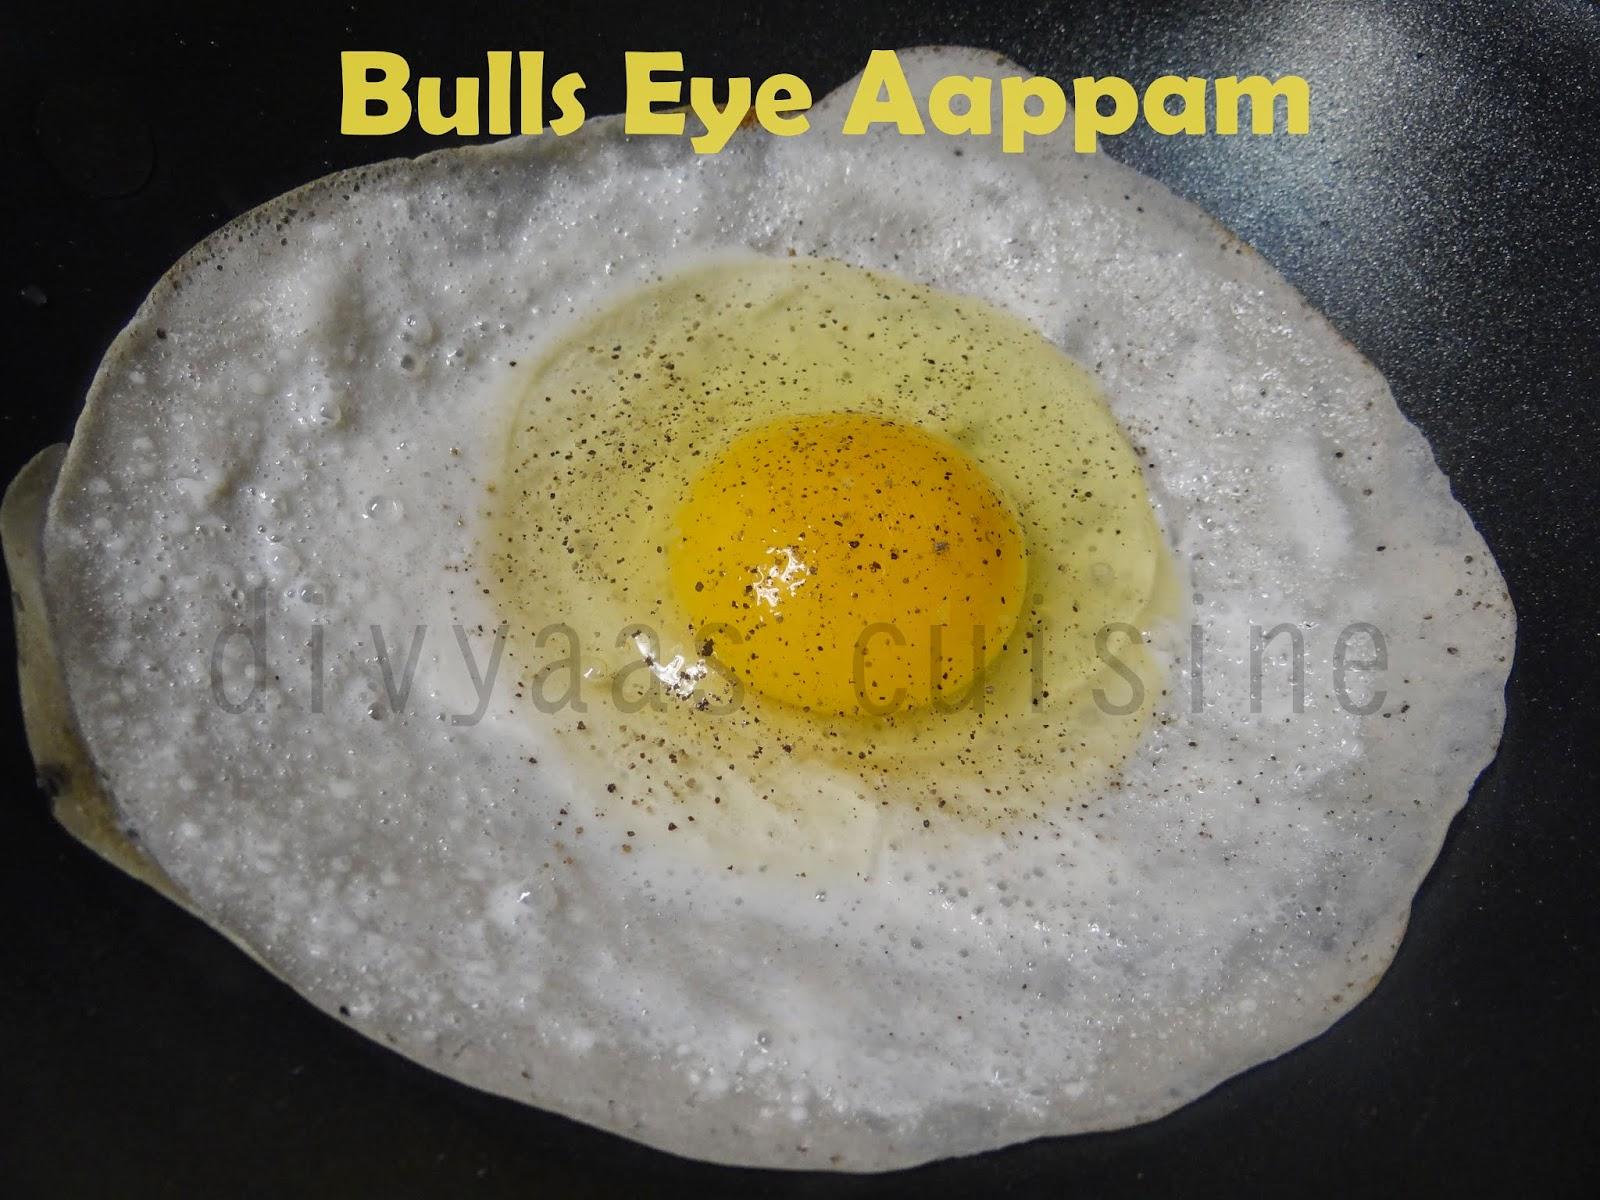 Bulls Eye Aappam